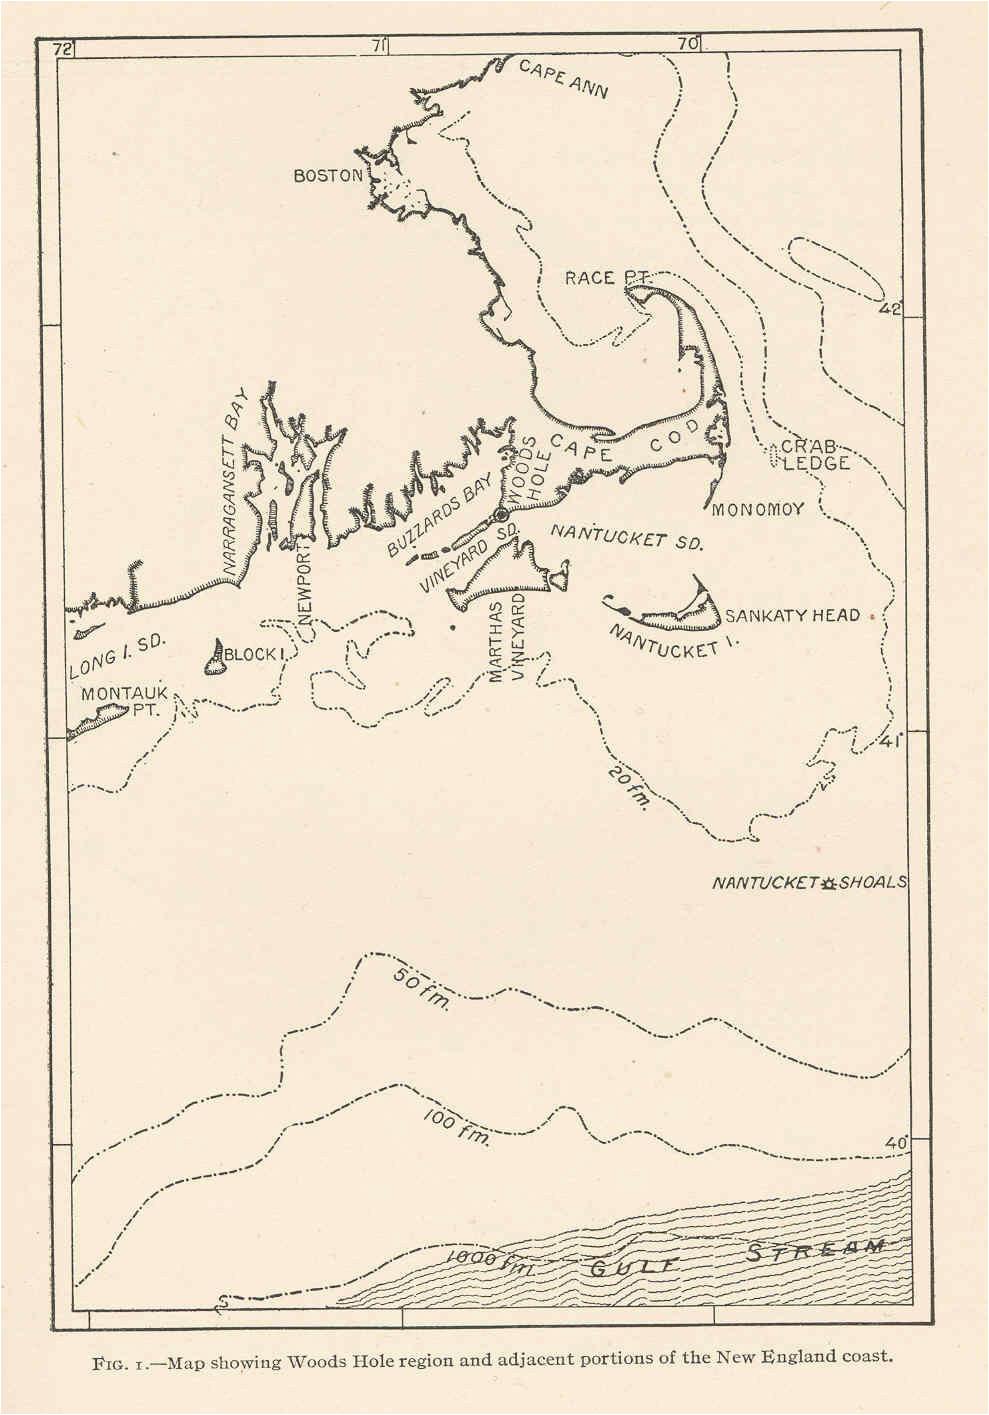 file fmib 42289 map showing woods hole region and adjacent